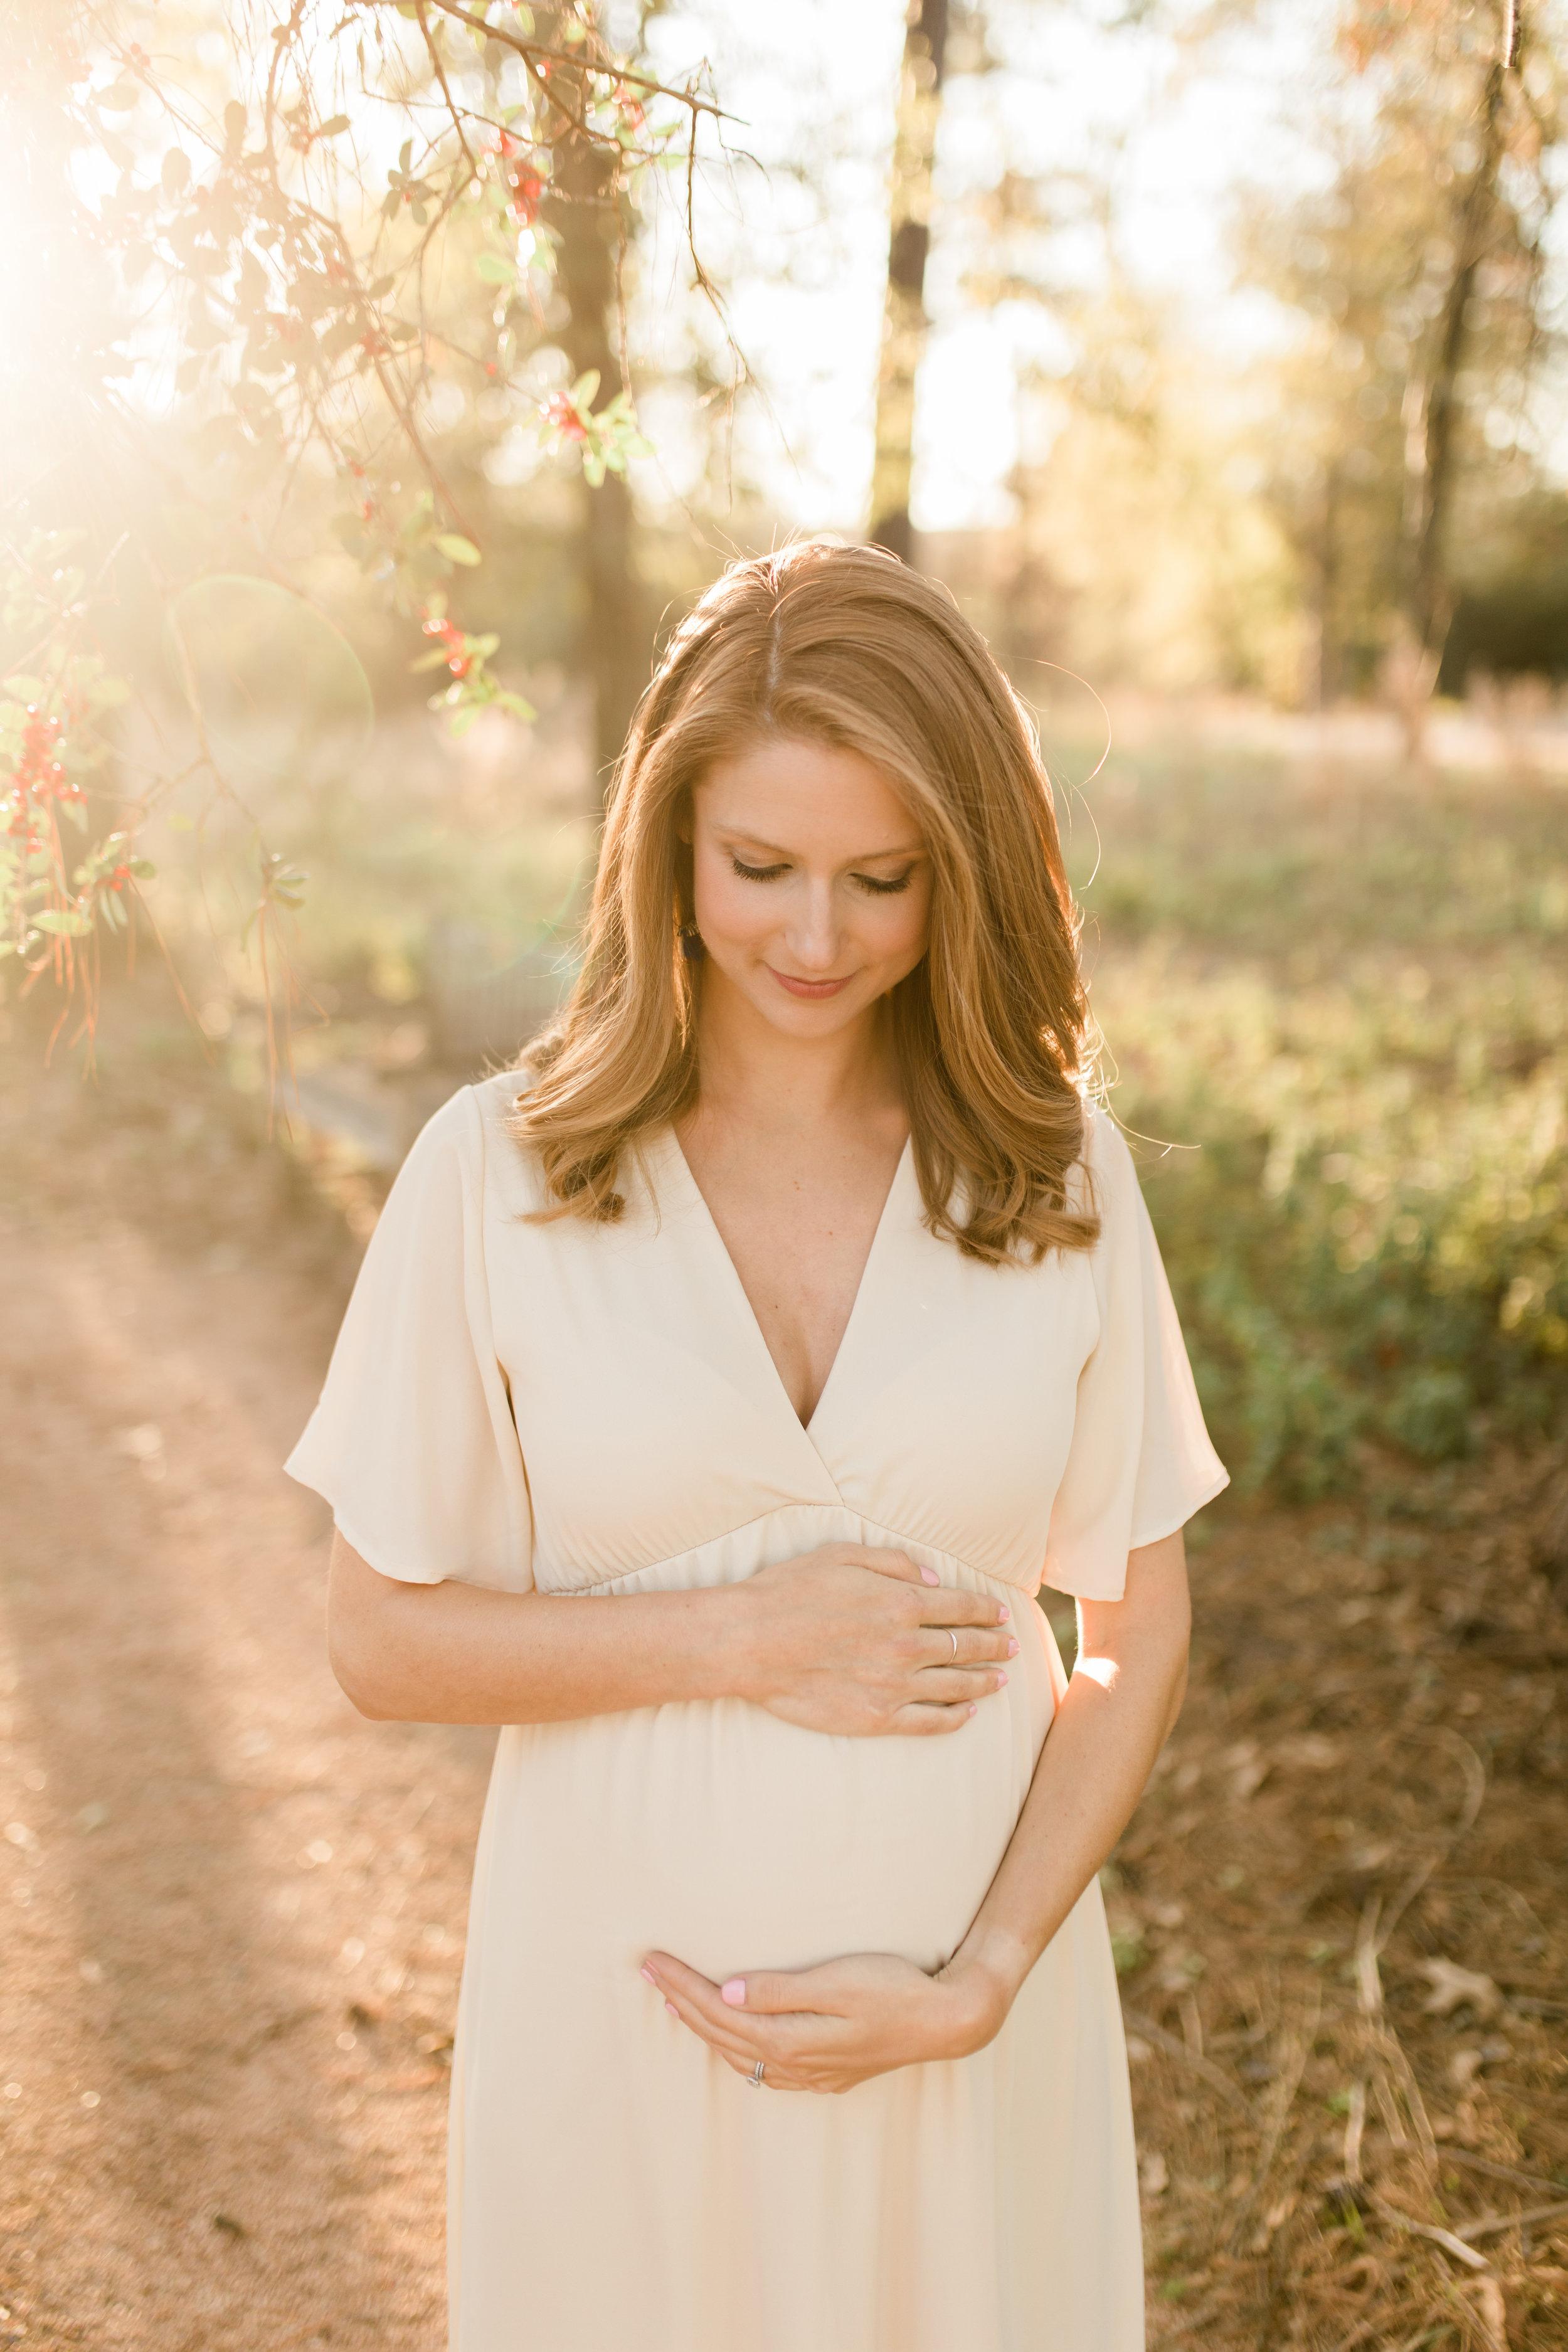 Houston Photographer, Houston Maternity Photographer, Houston Newborn Photographer